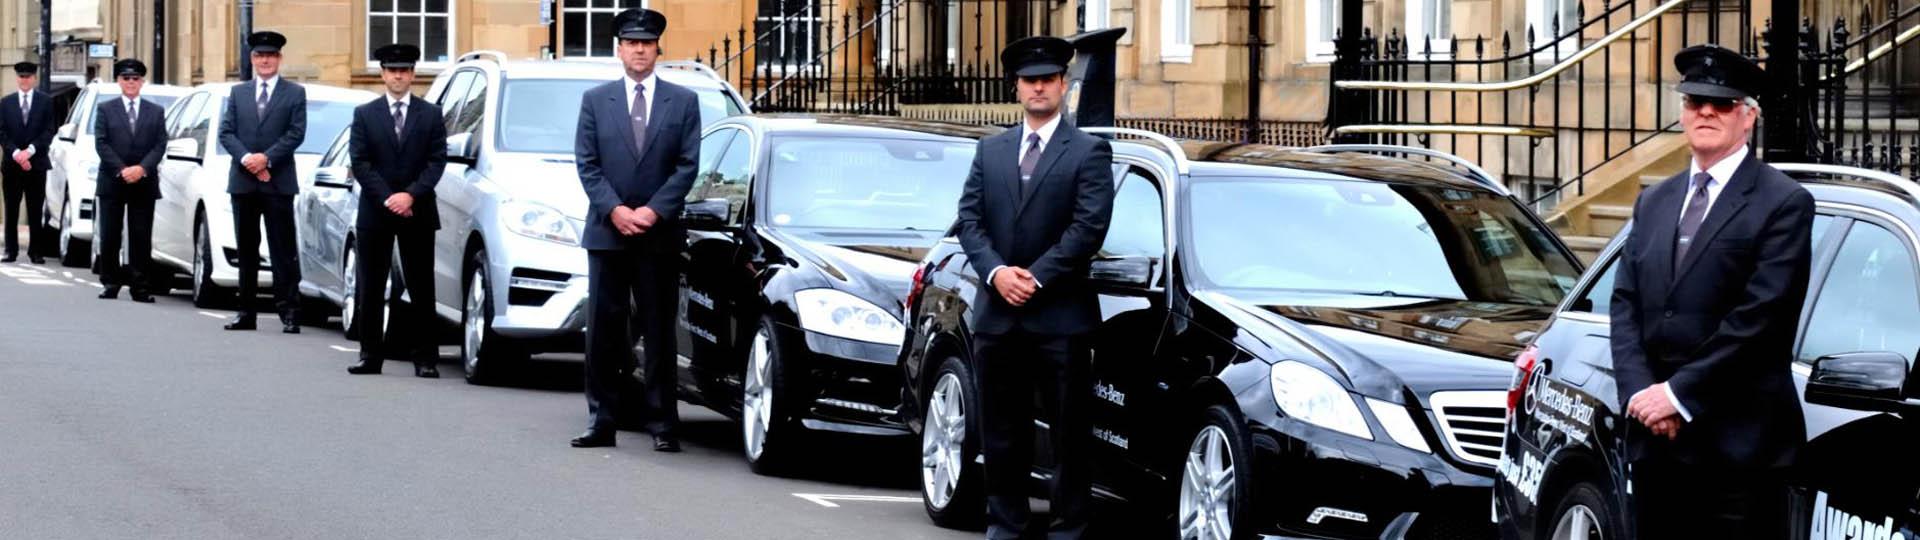 13 Maxi Cabs Sydney